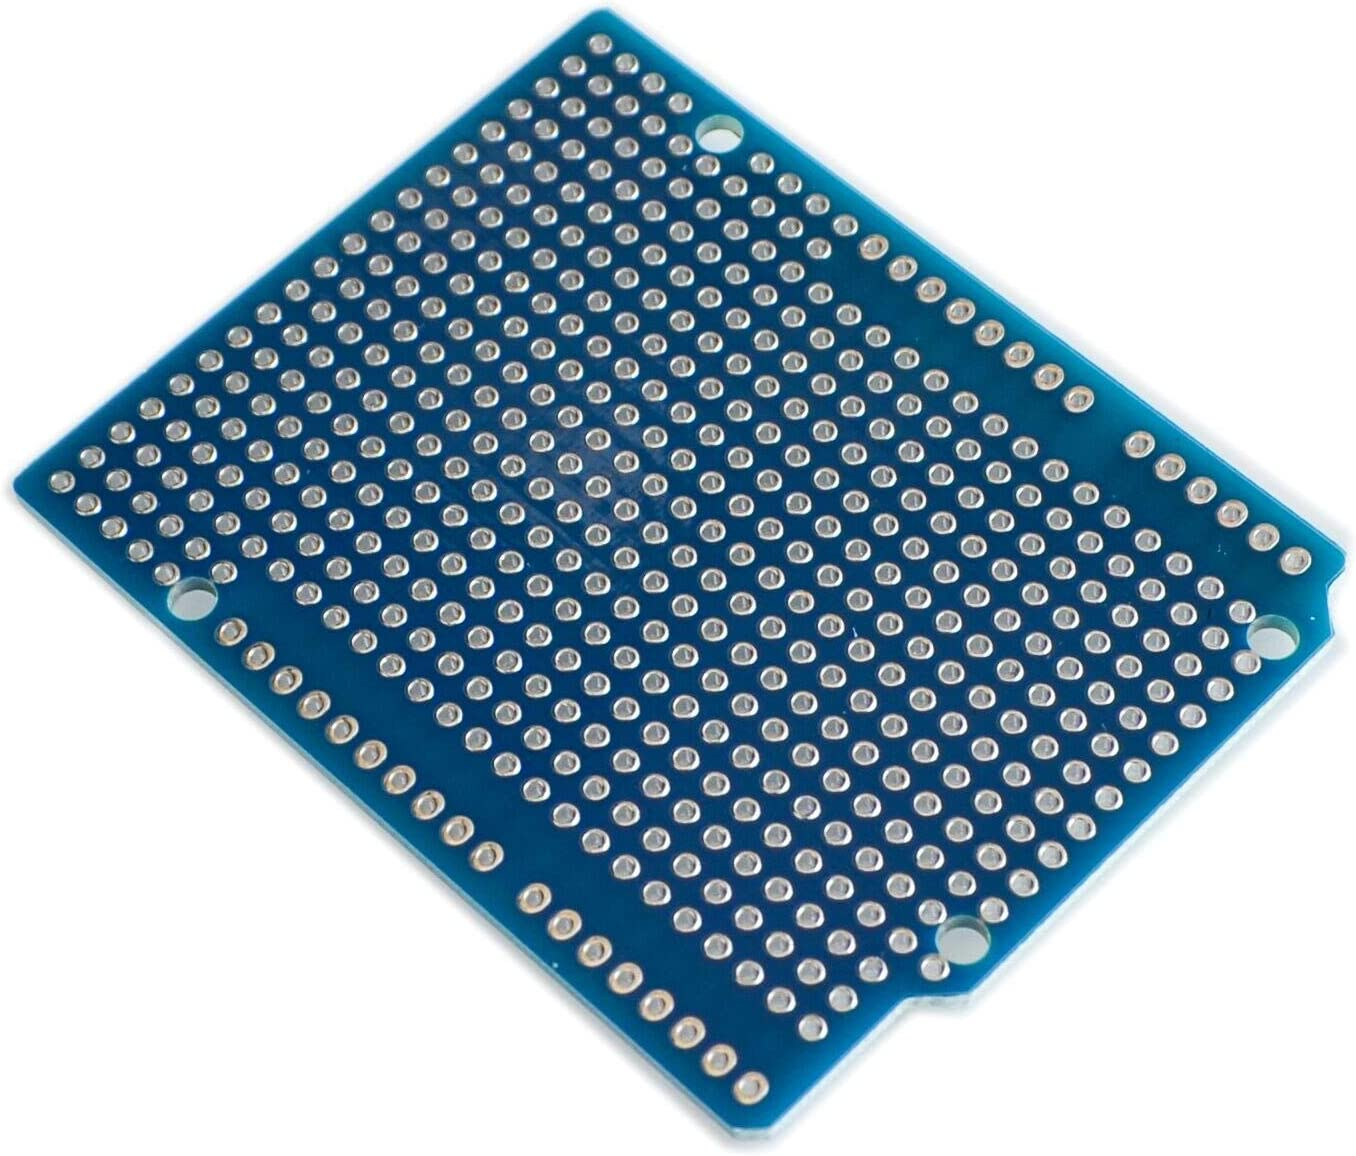 TD-ELECTRO 10PCS//LOT Prototype PCB Expansion Board for Arduino ATMEGA328P UNO R3 Shield FR-4 Fiber PCB Breadboard 2mm 2.54mm Pitch